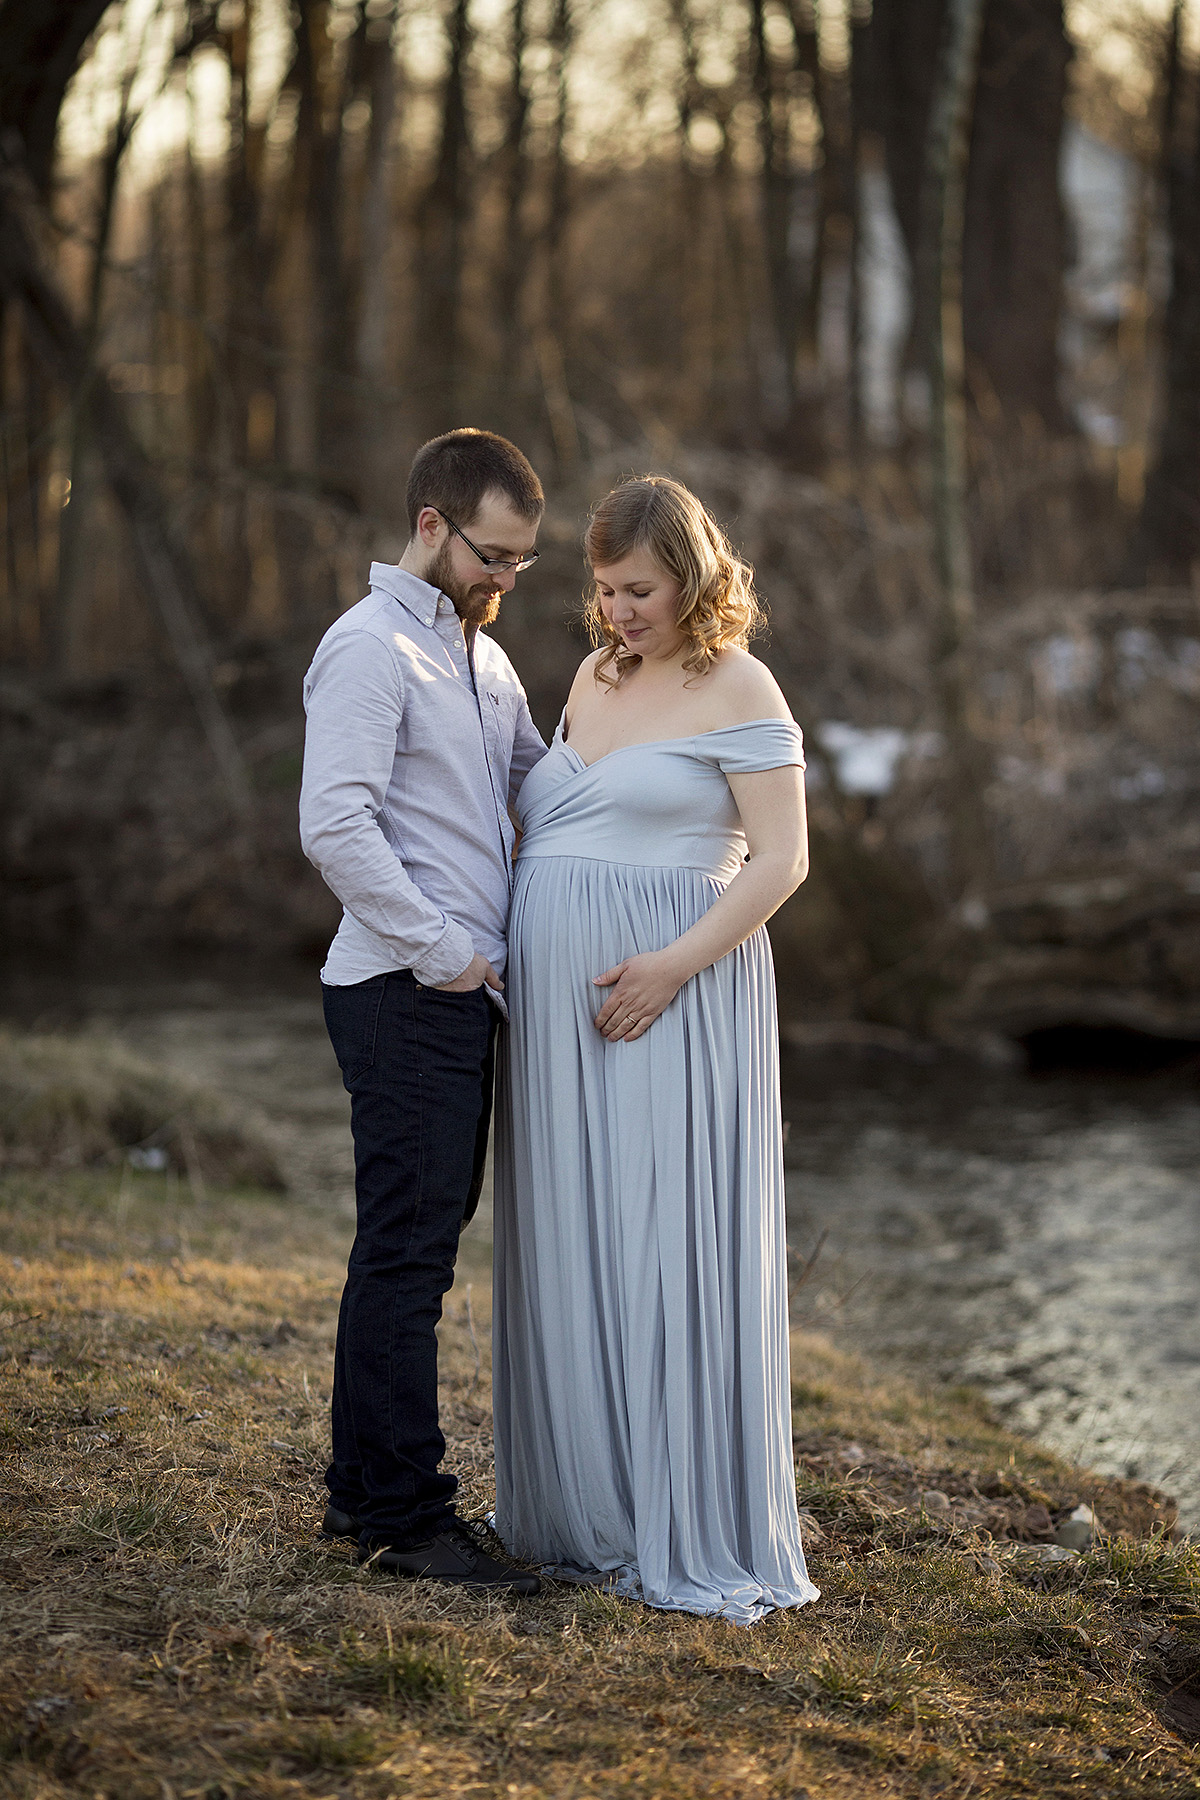 Angie_Englerth_Lancater_Maternity_Photographer_Wardobe_Blue_005.jpg